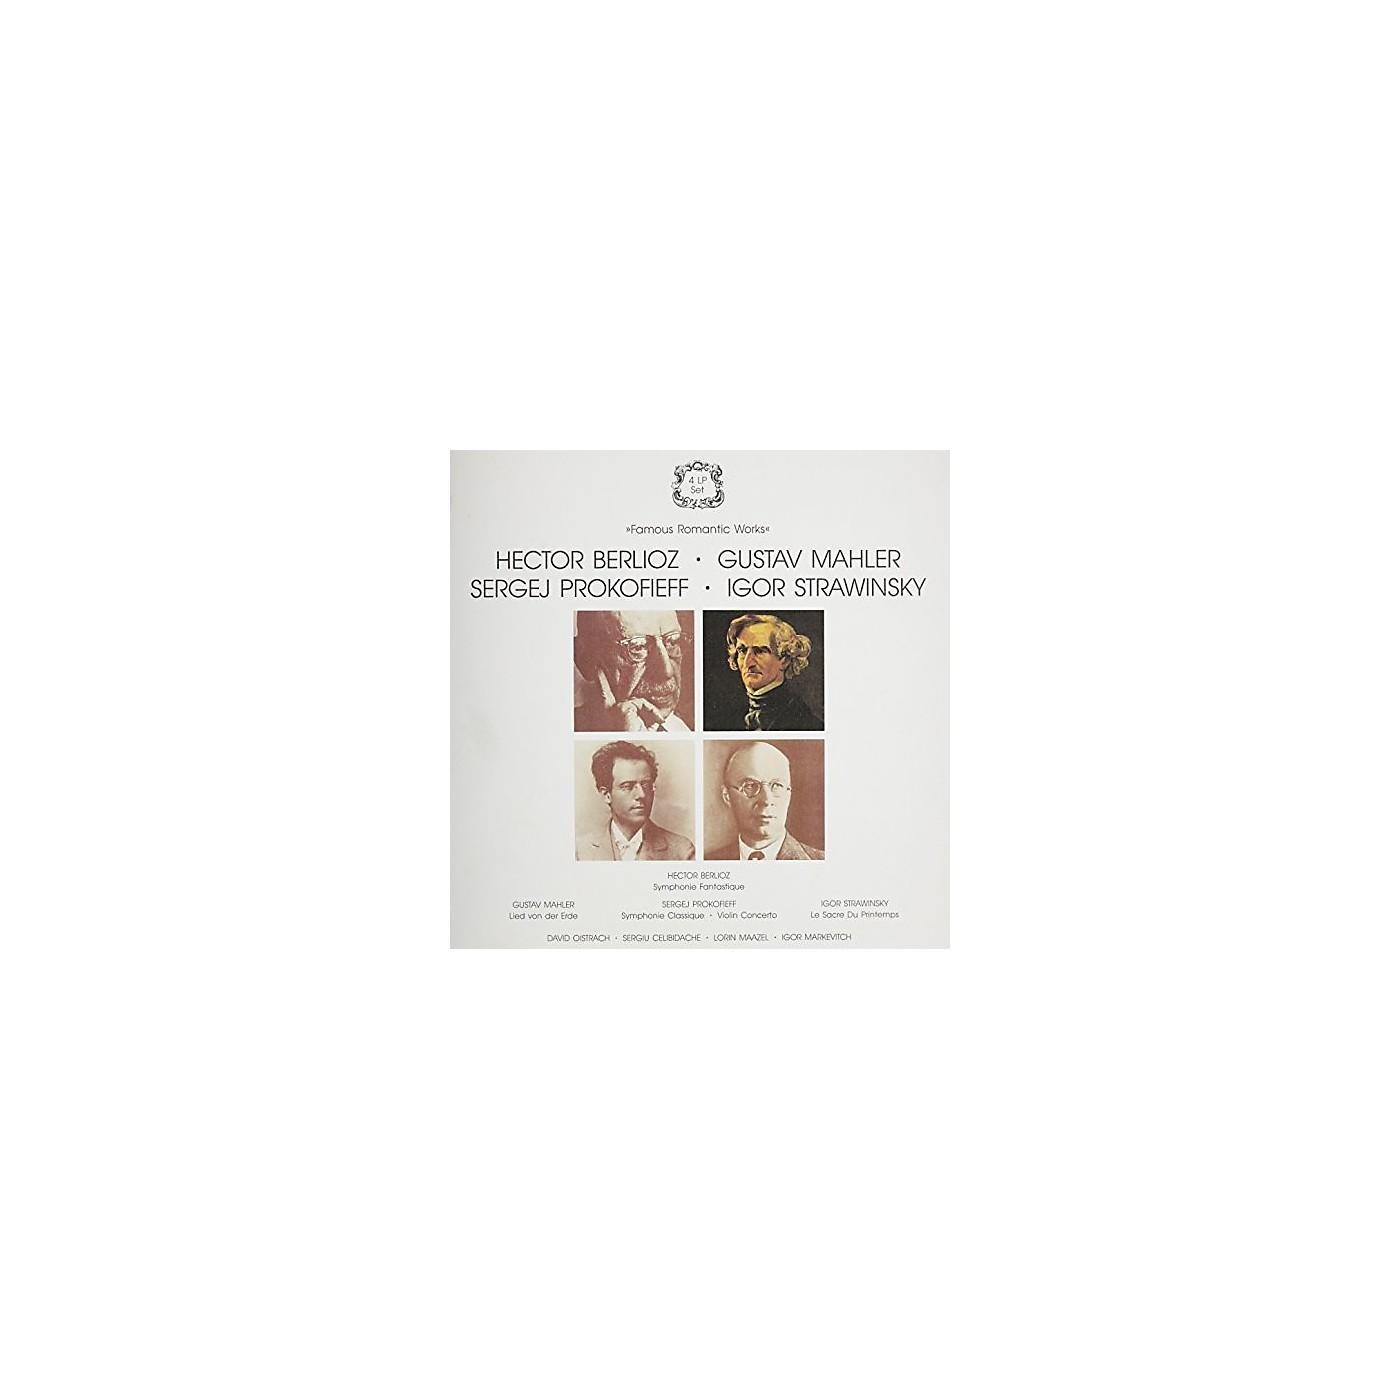 Alliance Berlioz - Famous Romantic Works thumbnail